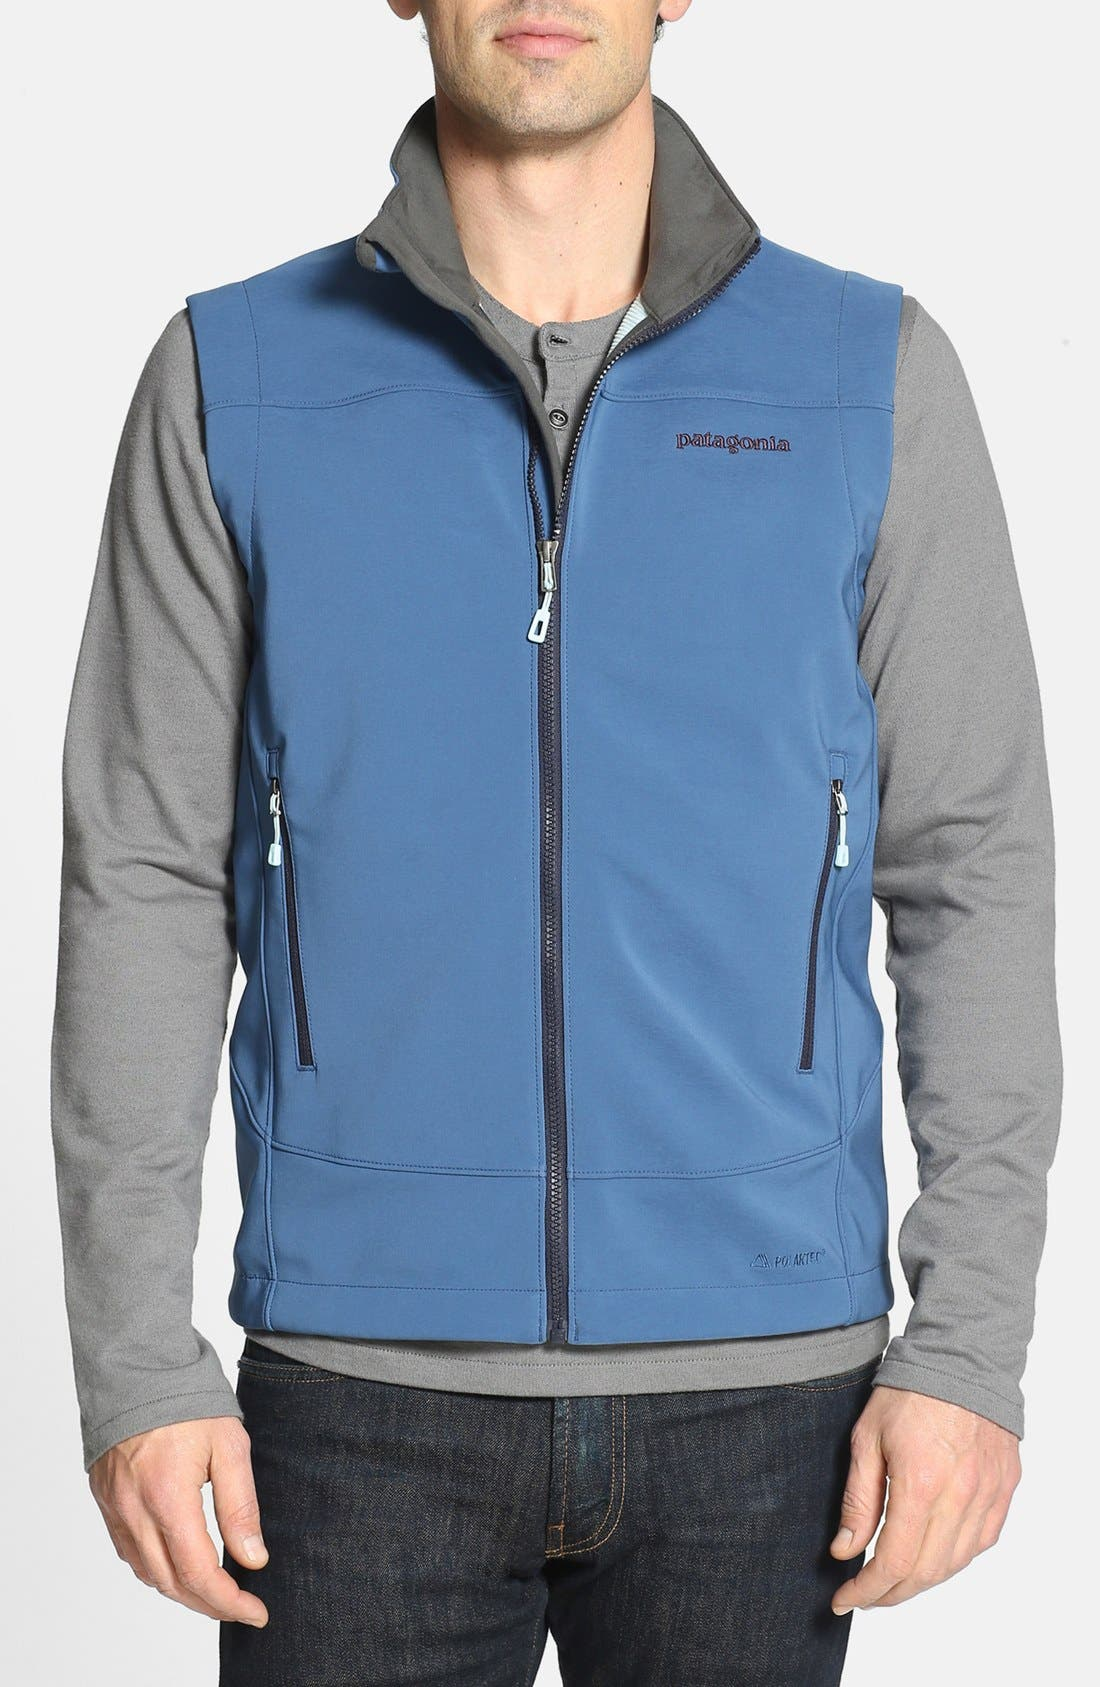 Main Image - Patagonia 'Adze' Soft Shell Vest